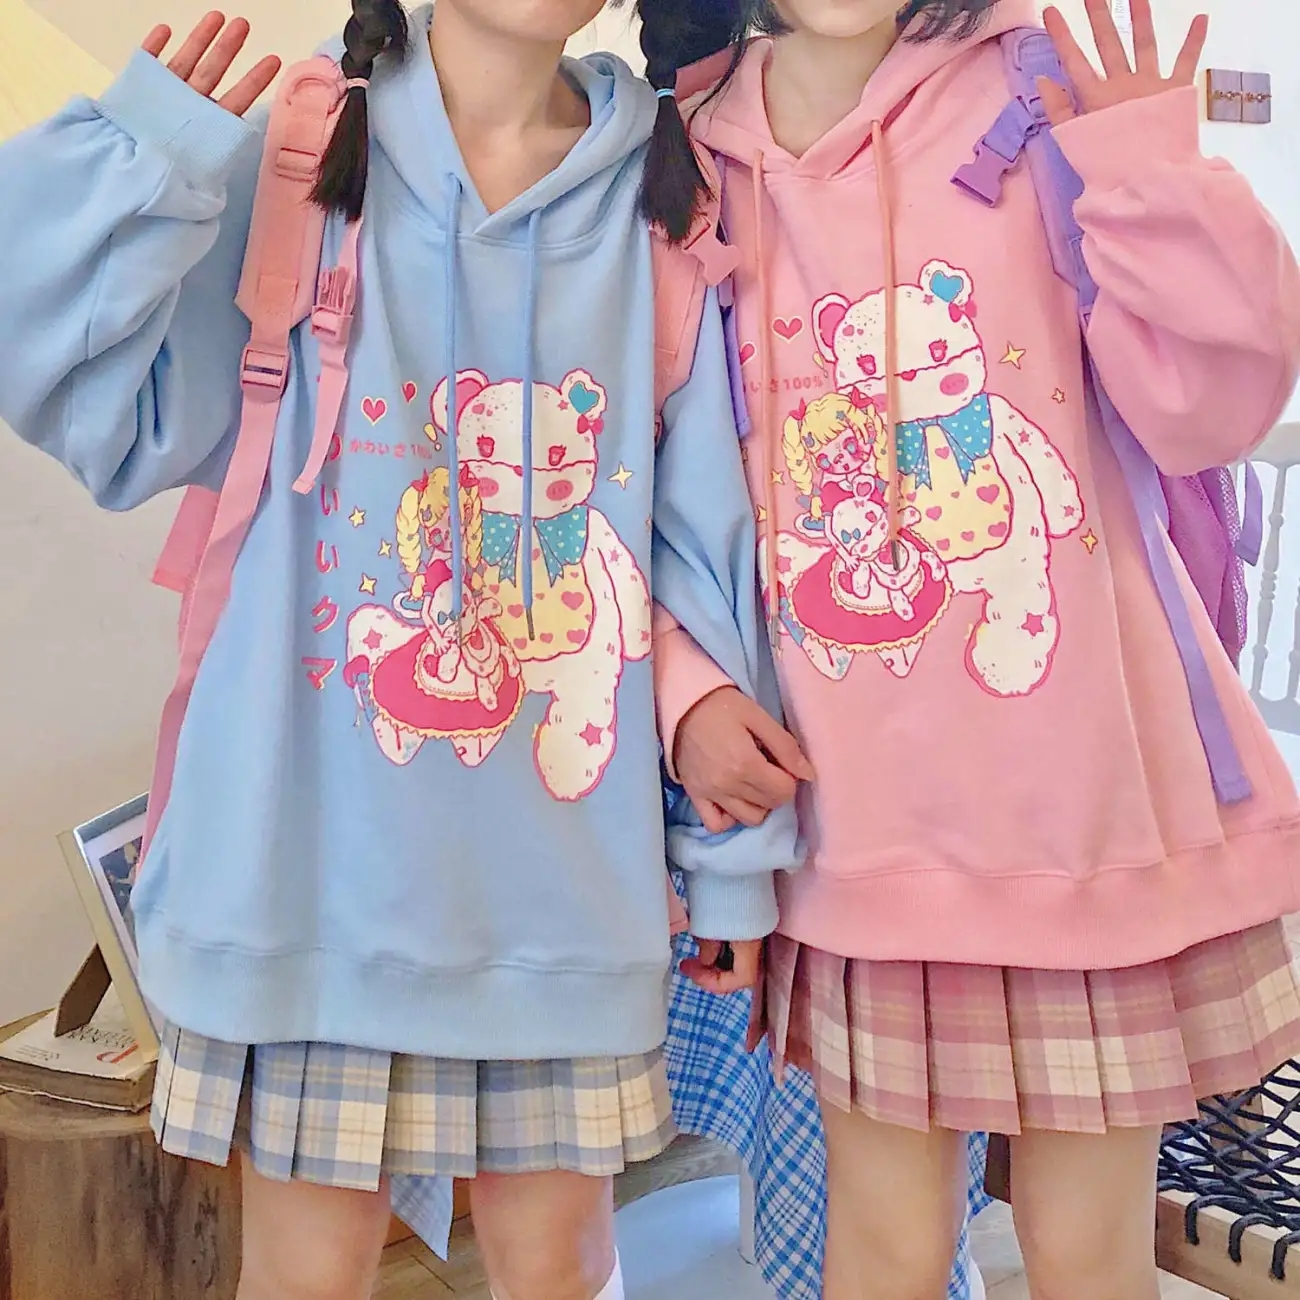 Oversized Hoodies Gothic Harajuku Kawaii Anime Print Hoodies Jacket Women Spring Autumn Long Sleeve Hoodies E Girl Clothes